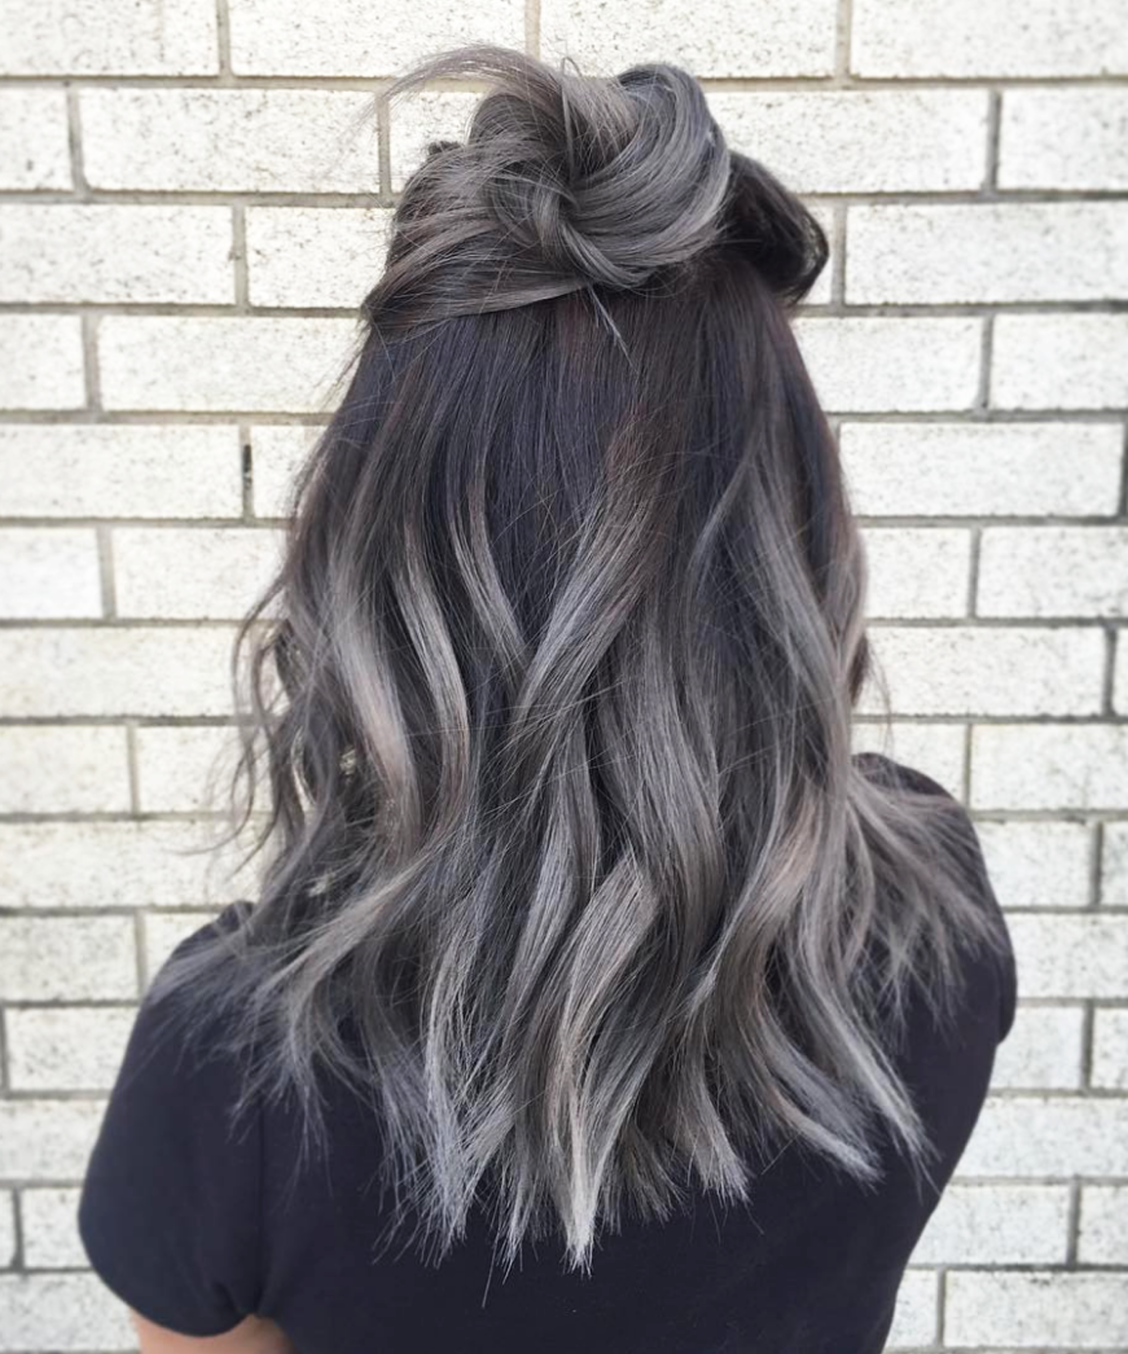 33 hair looks to help you beat your hair rut | beauty | hair